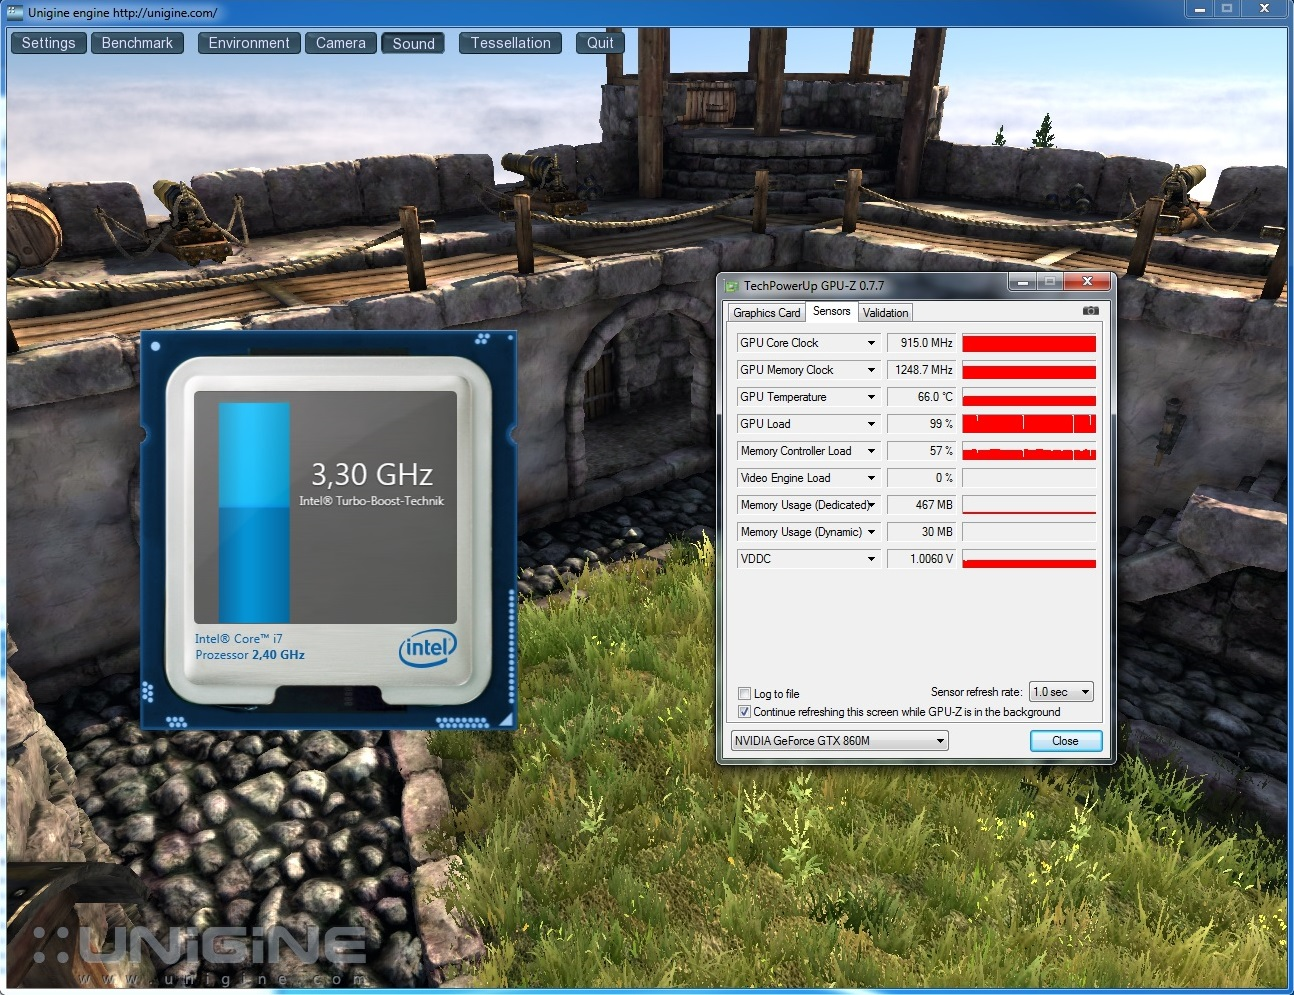 2.4 ghz blocker | Handy 433MHz Blocker